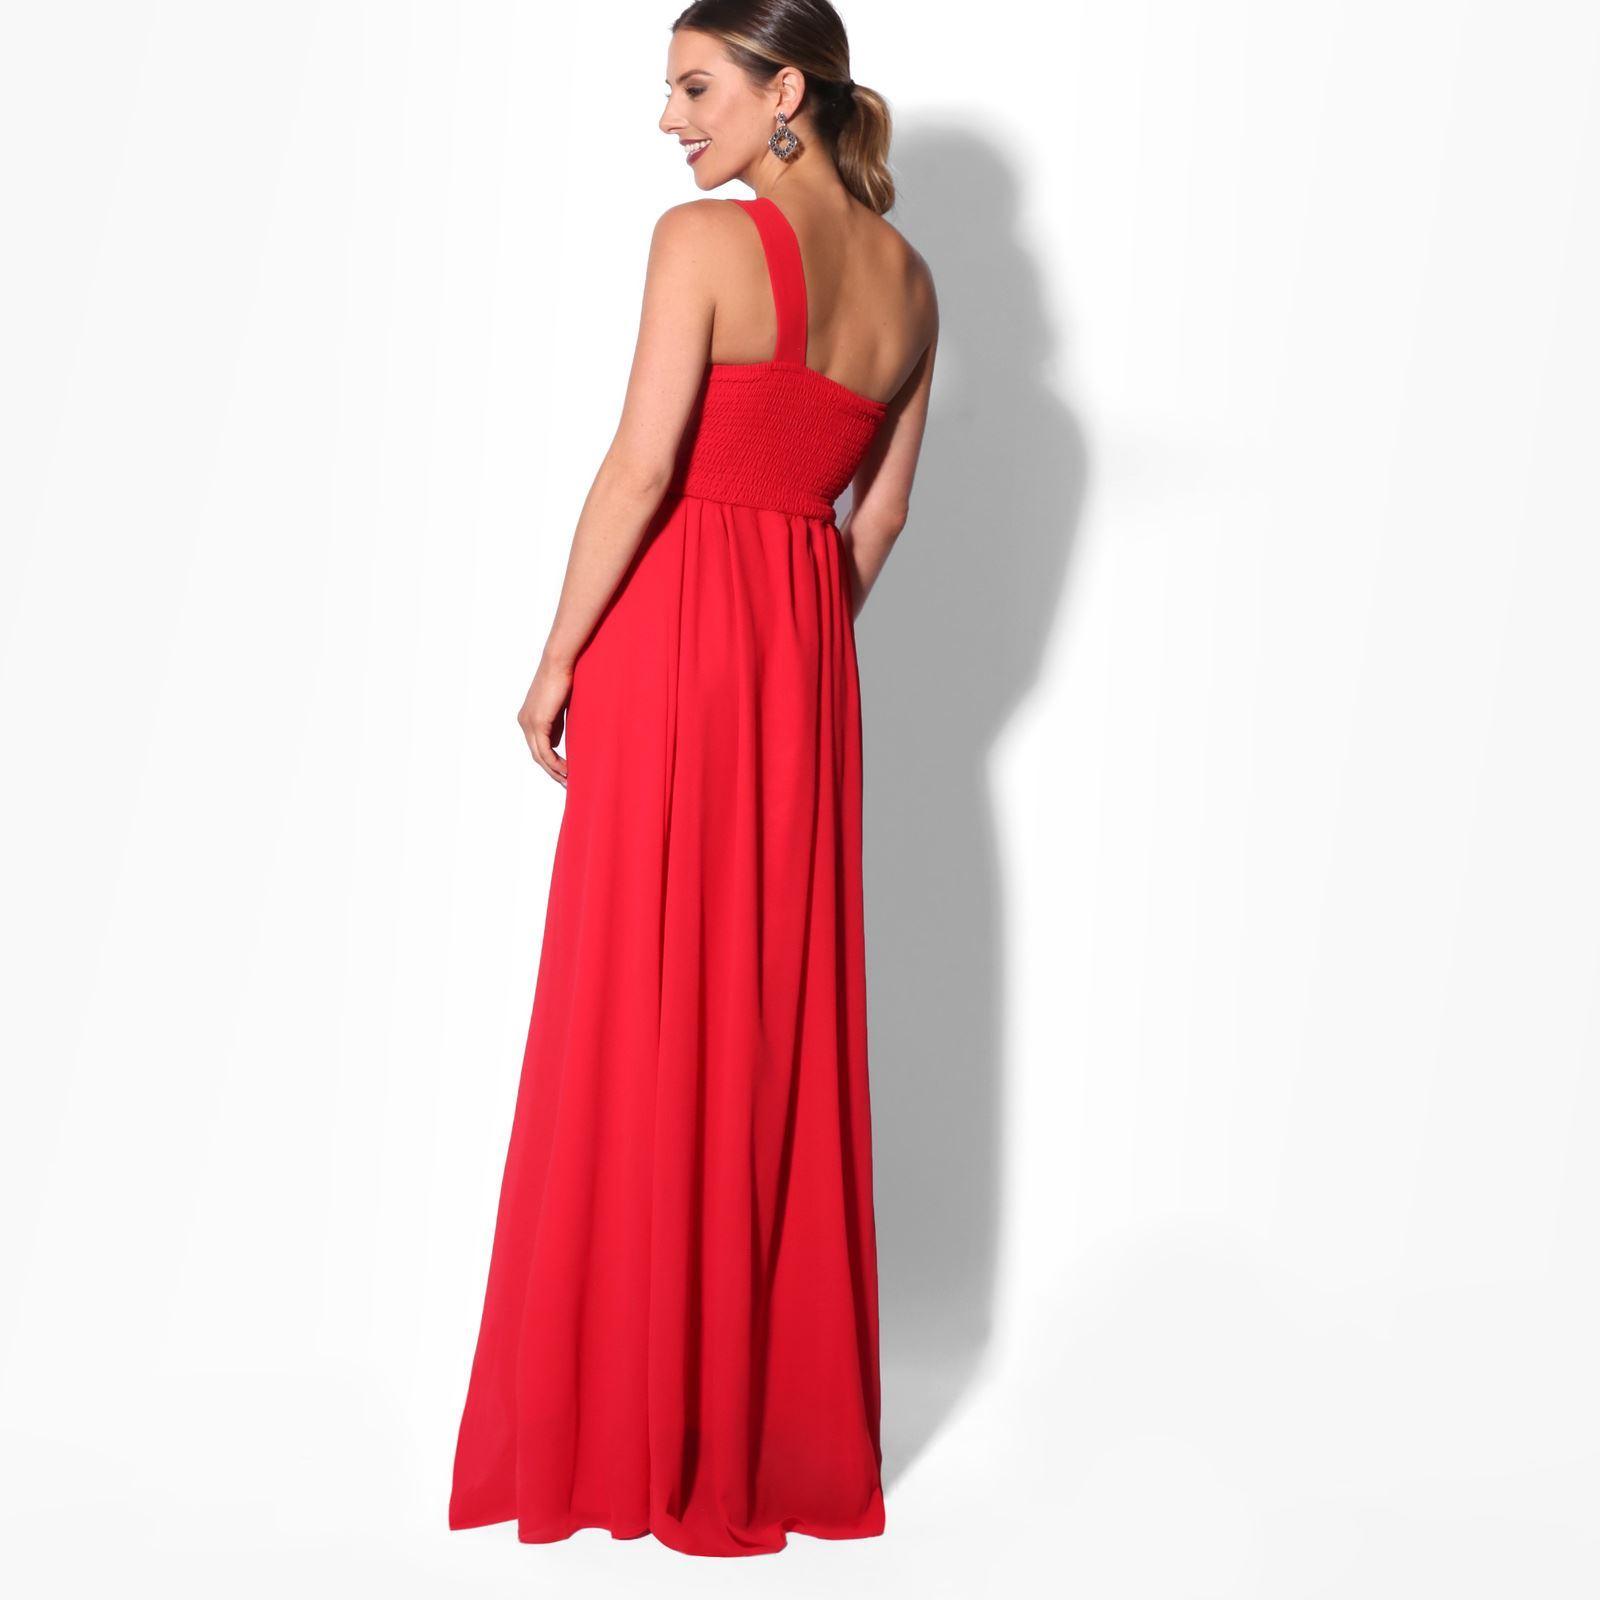 Womens-Wedding-Bridesmaid-Prom-Dress-Formal-One-Off-Shoulder-Long-Evening-8-18 thumbnail 55